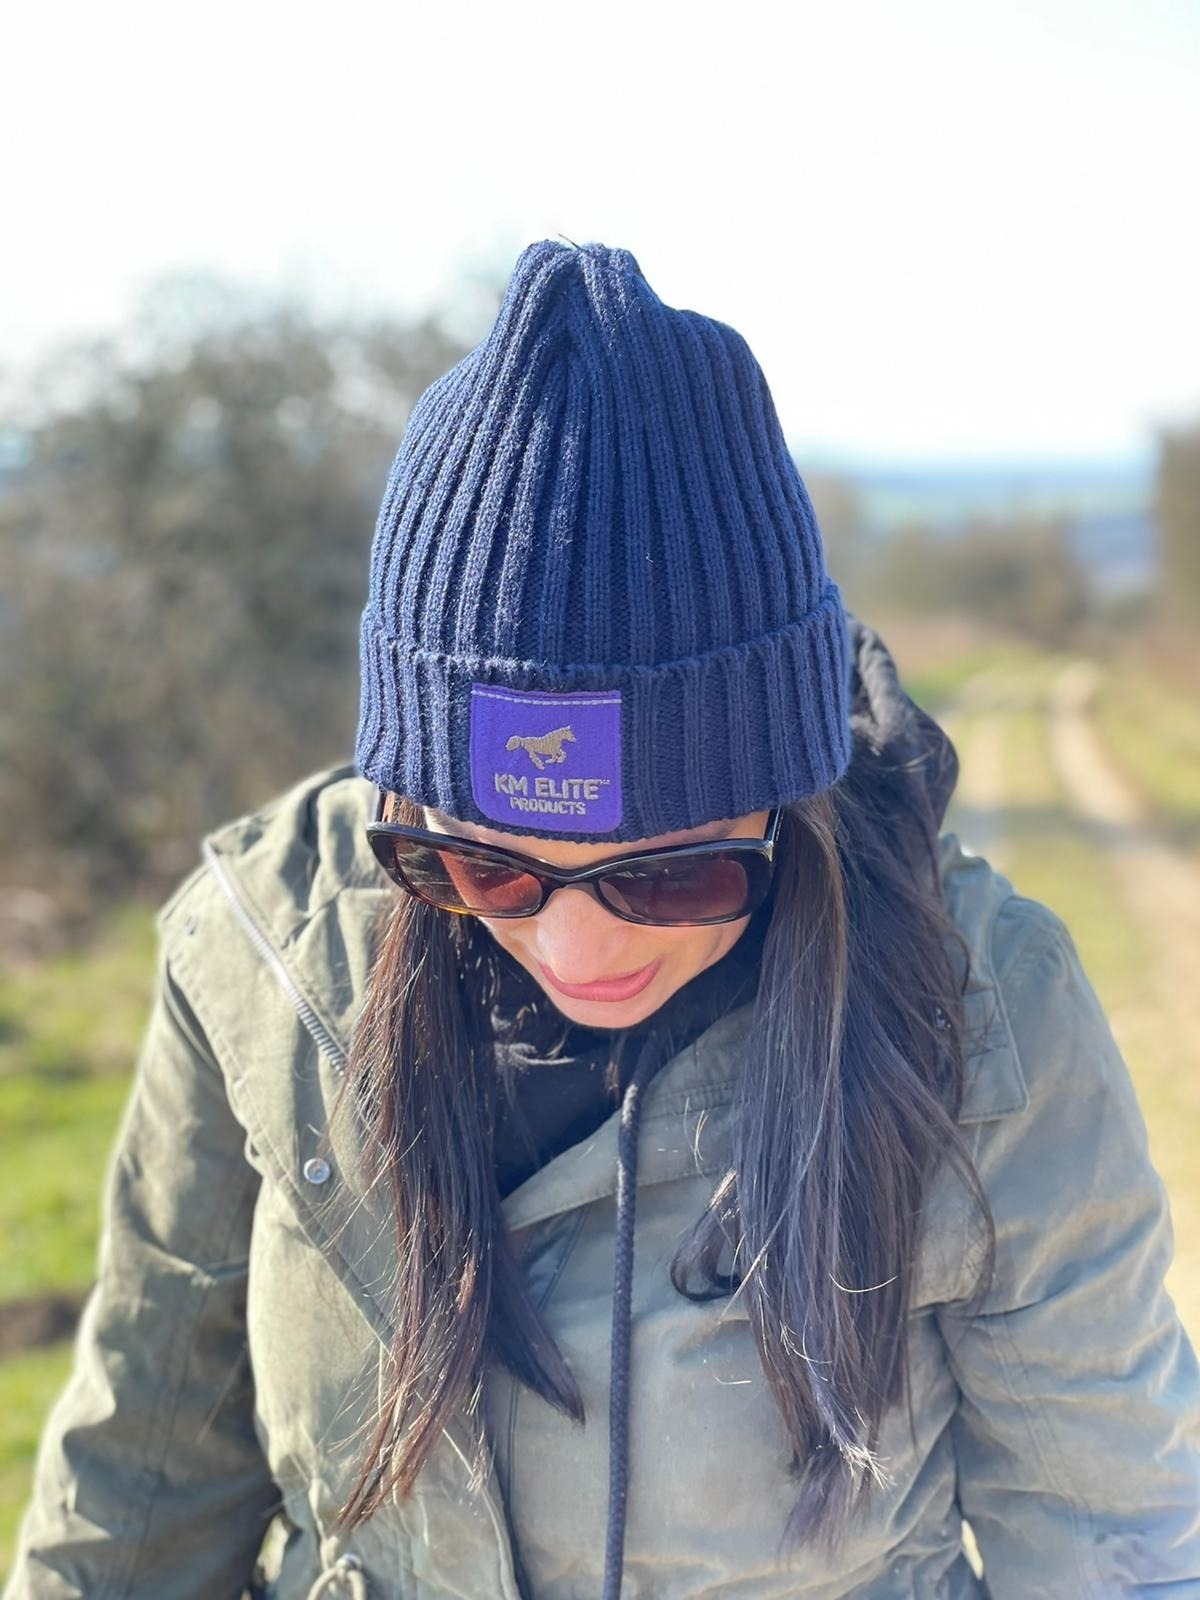 KM Elite Products Beanie Hat